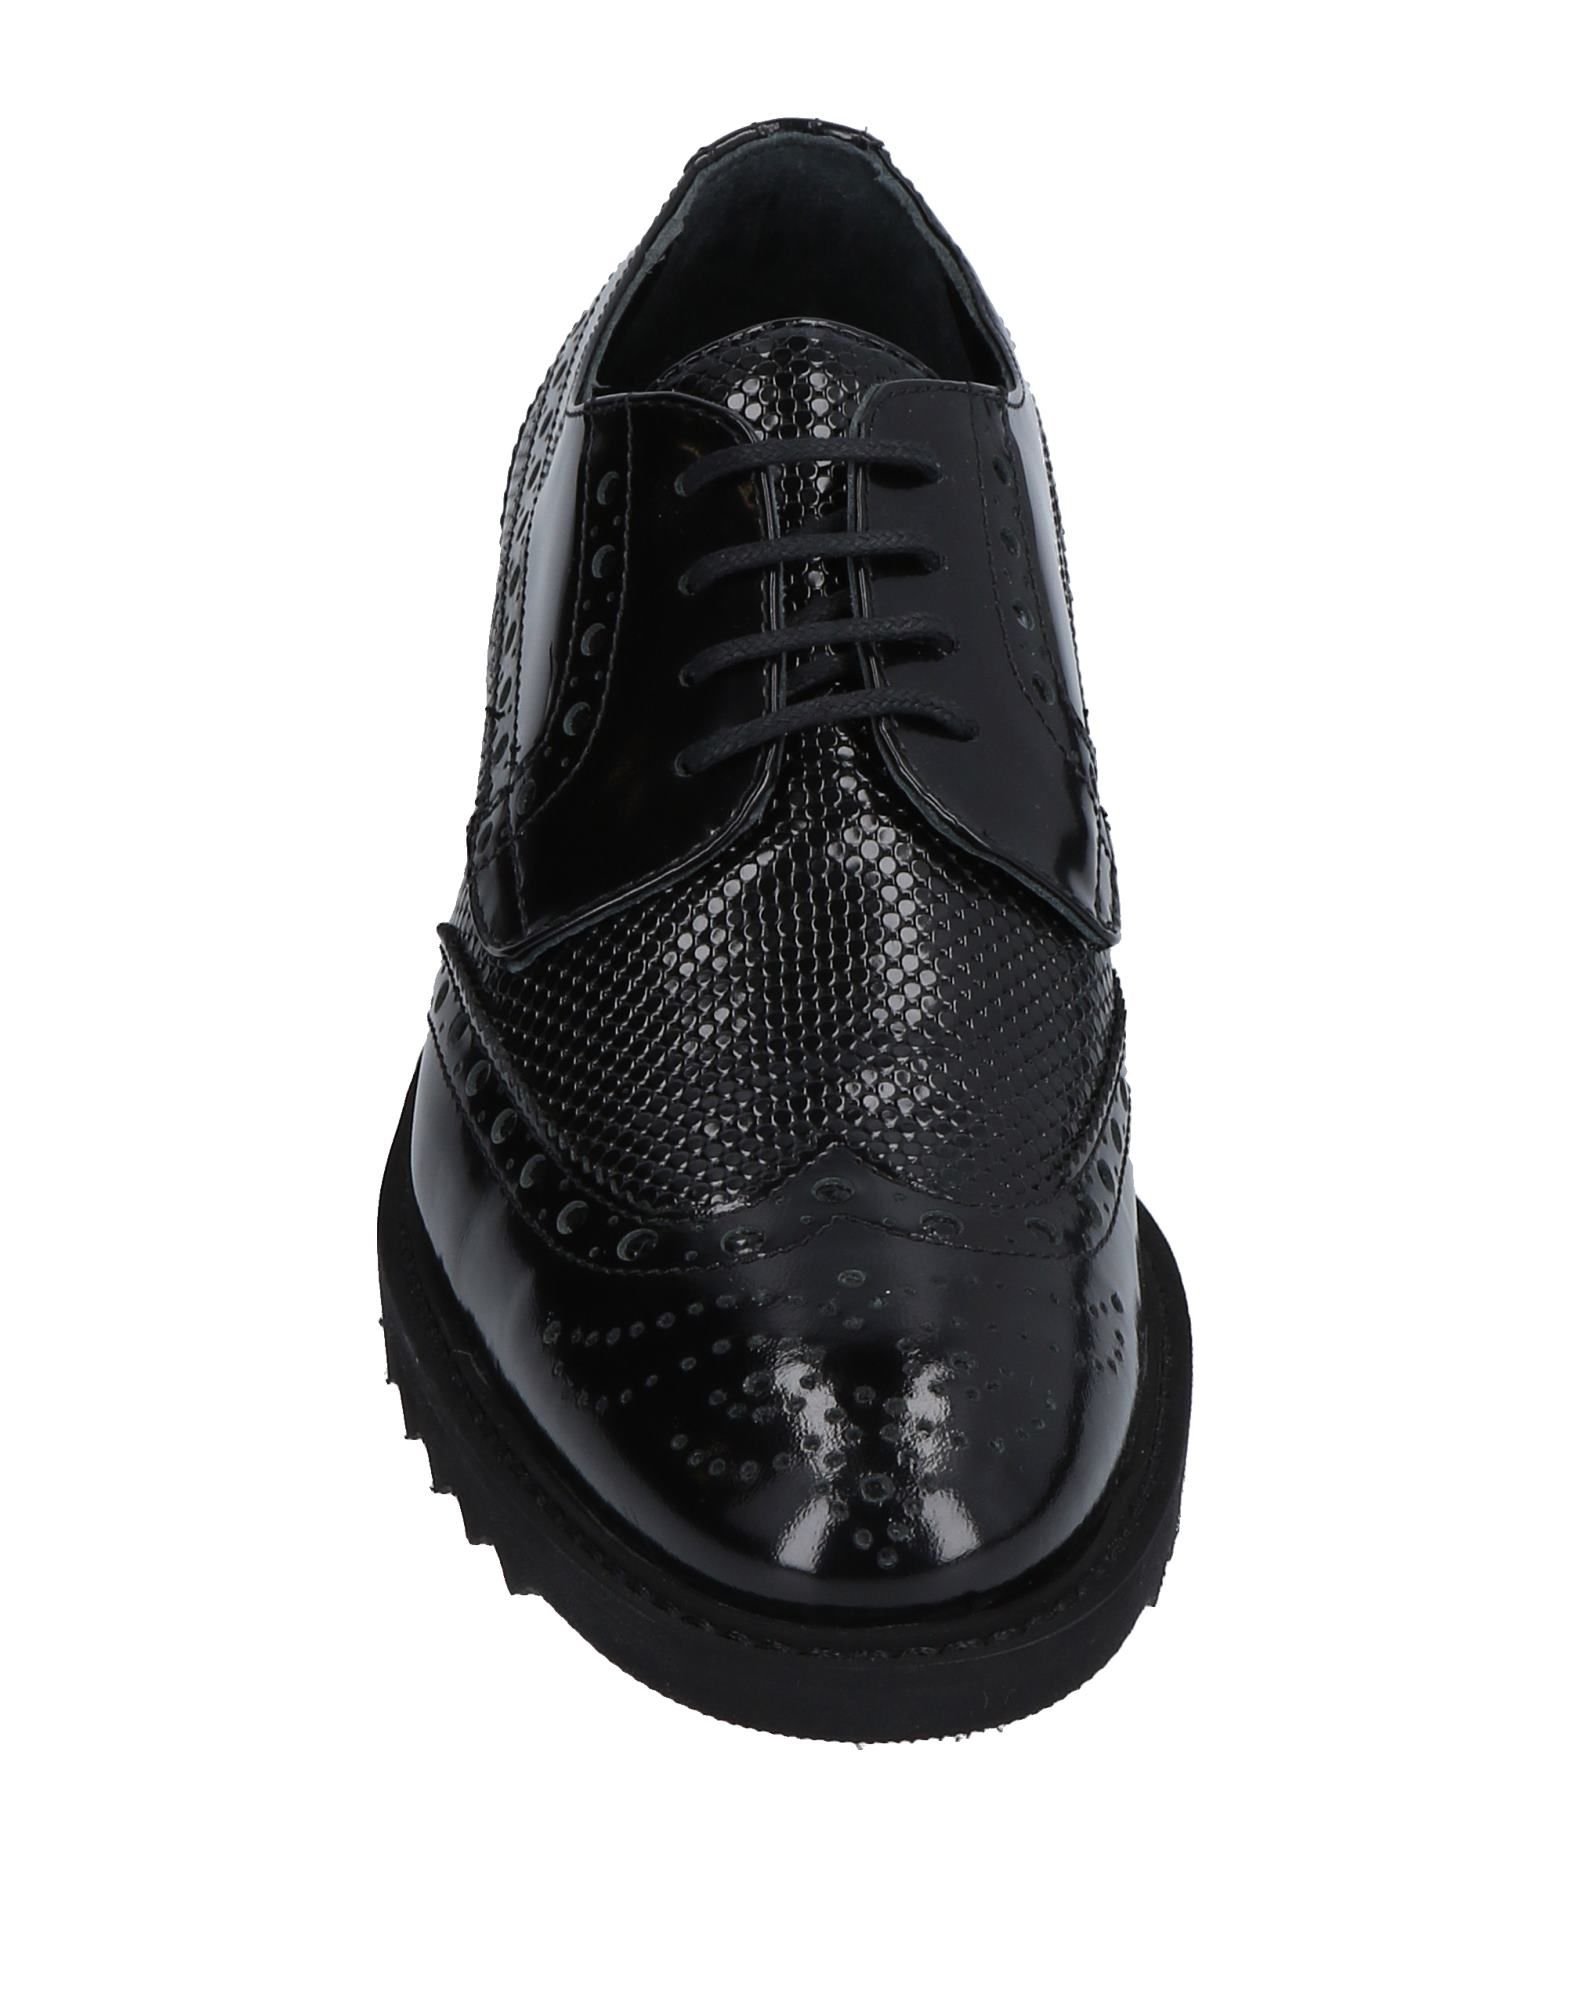 Gut um Schnürschuhe billige Schuhe zu tragenRoberto Botticelli Schnürschuhe um Damen  11512750ML 9e2ccf